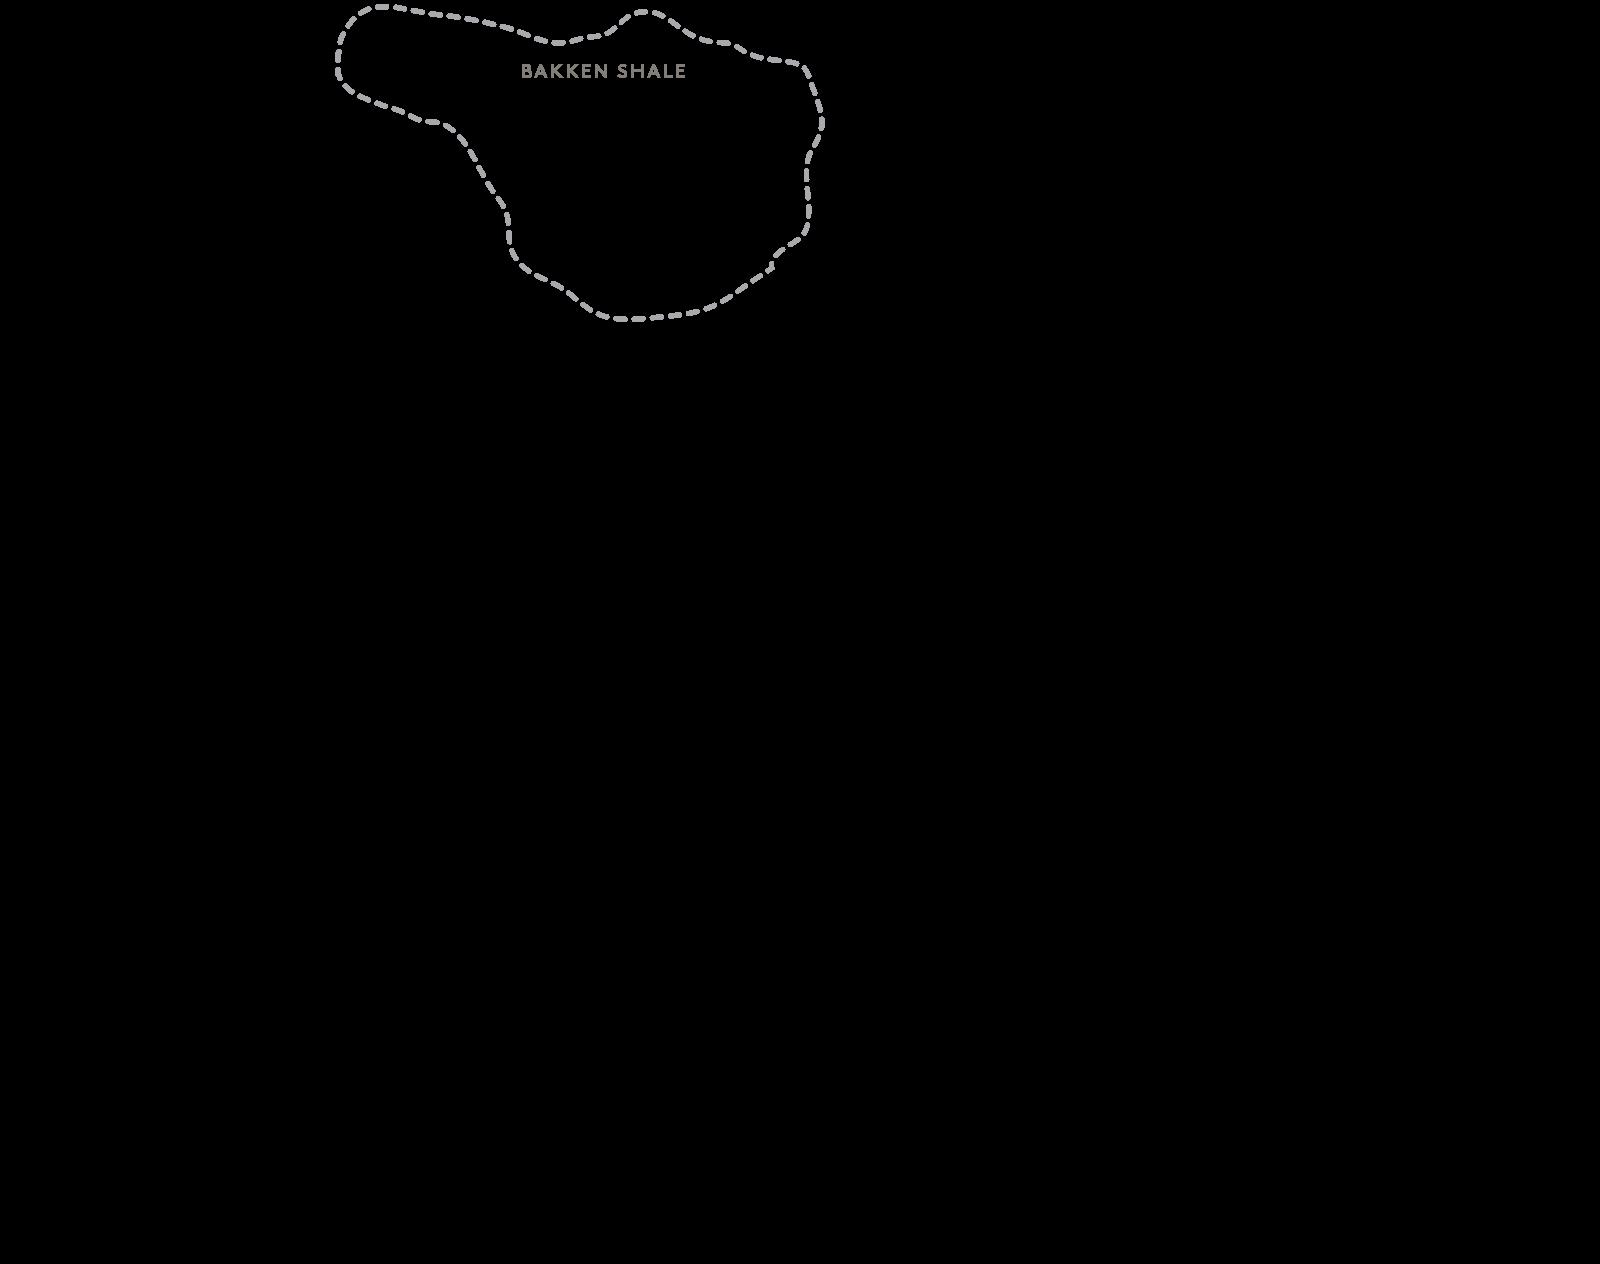 Bakken Shale Petroleum Deposit